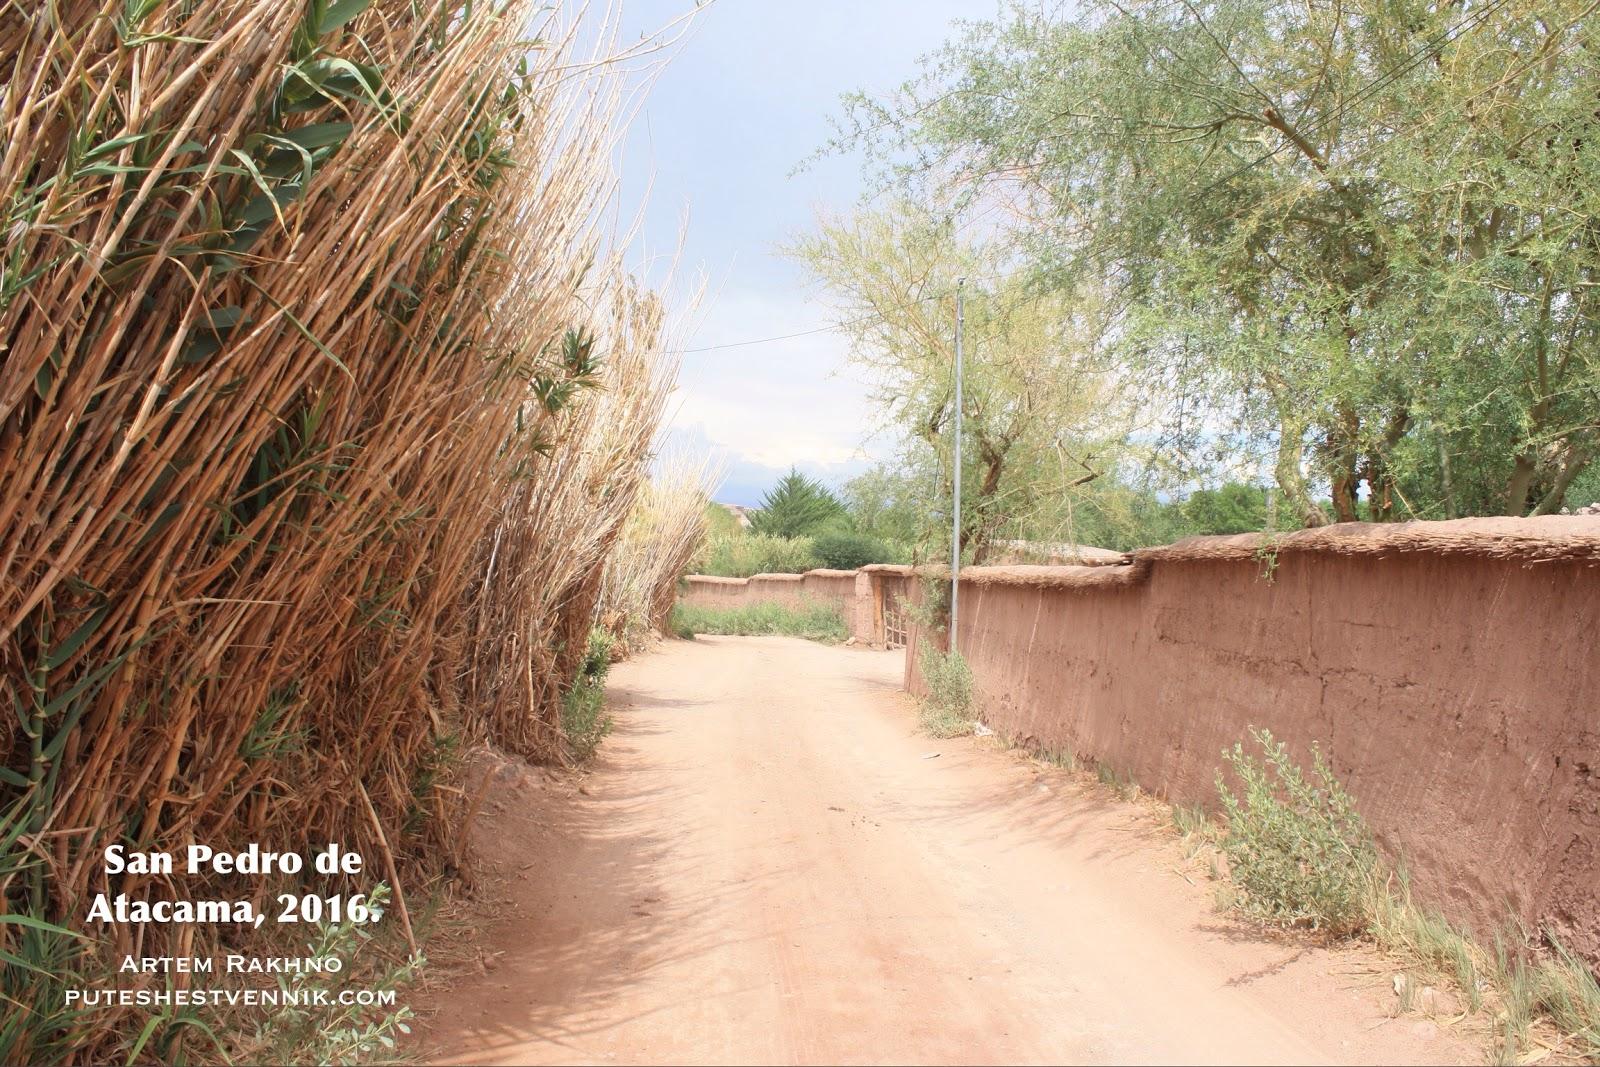 Тростник в Сан-Педро-де-Атакама